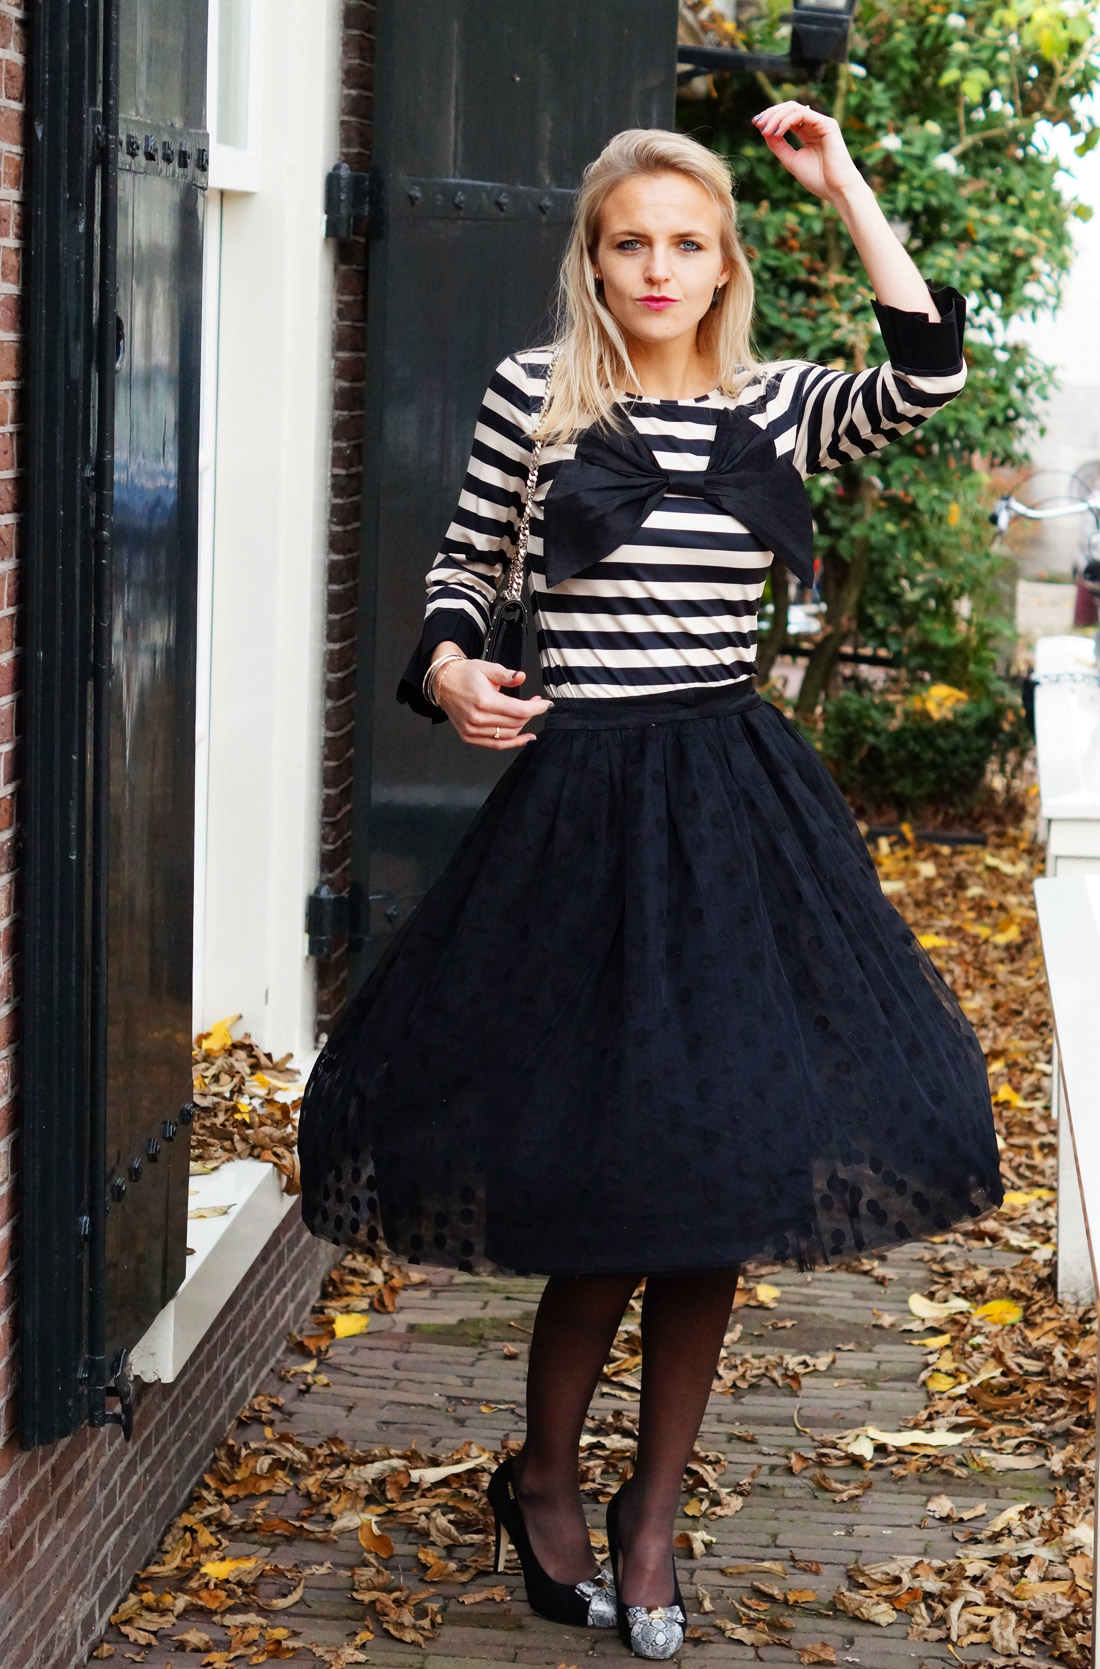 Bag-at-you---Fashion-blog---Dainty-Jewell'---Polka-Dot-Tutu-Skirt---Supertrash-skirt---heels---Just-dance